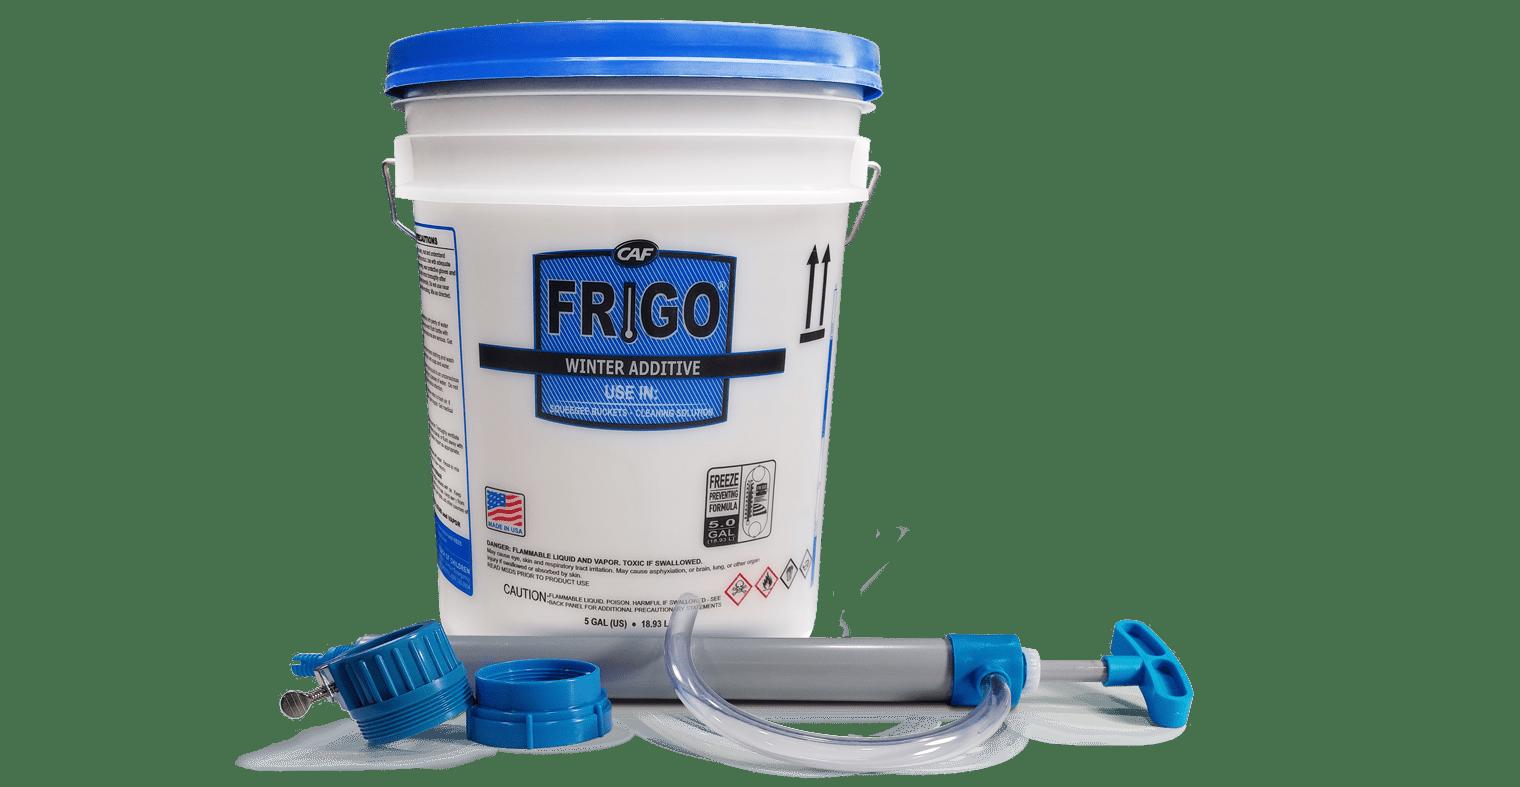 frigo winter additive bucket and pump